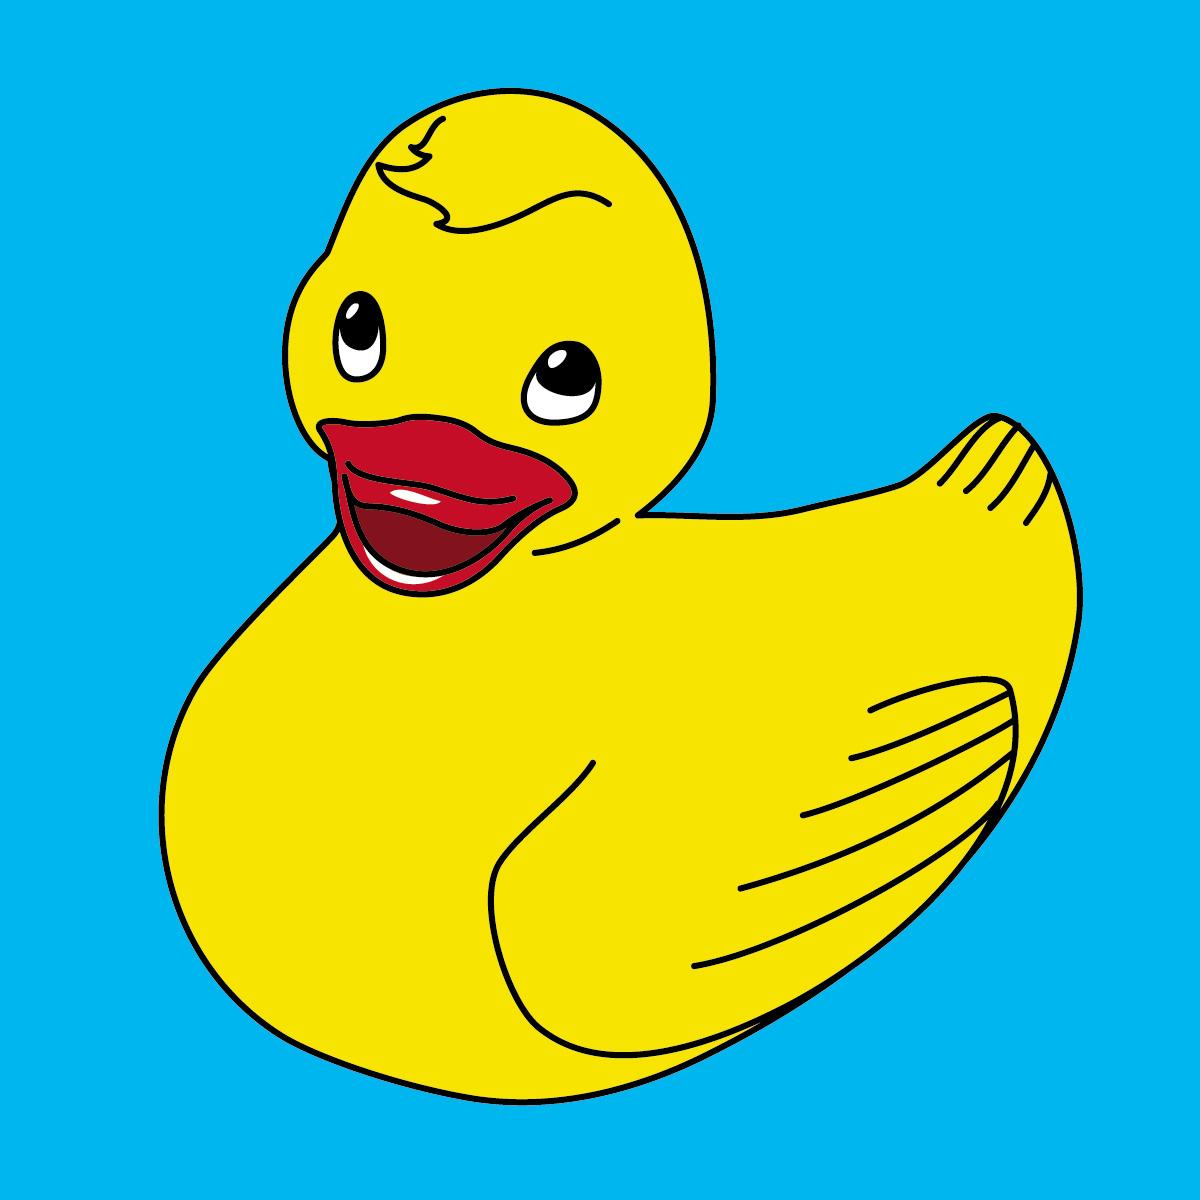 rubber duck clip art cliparts co rubber duck clip art free black and white rubber ducky clip art free